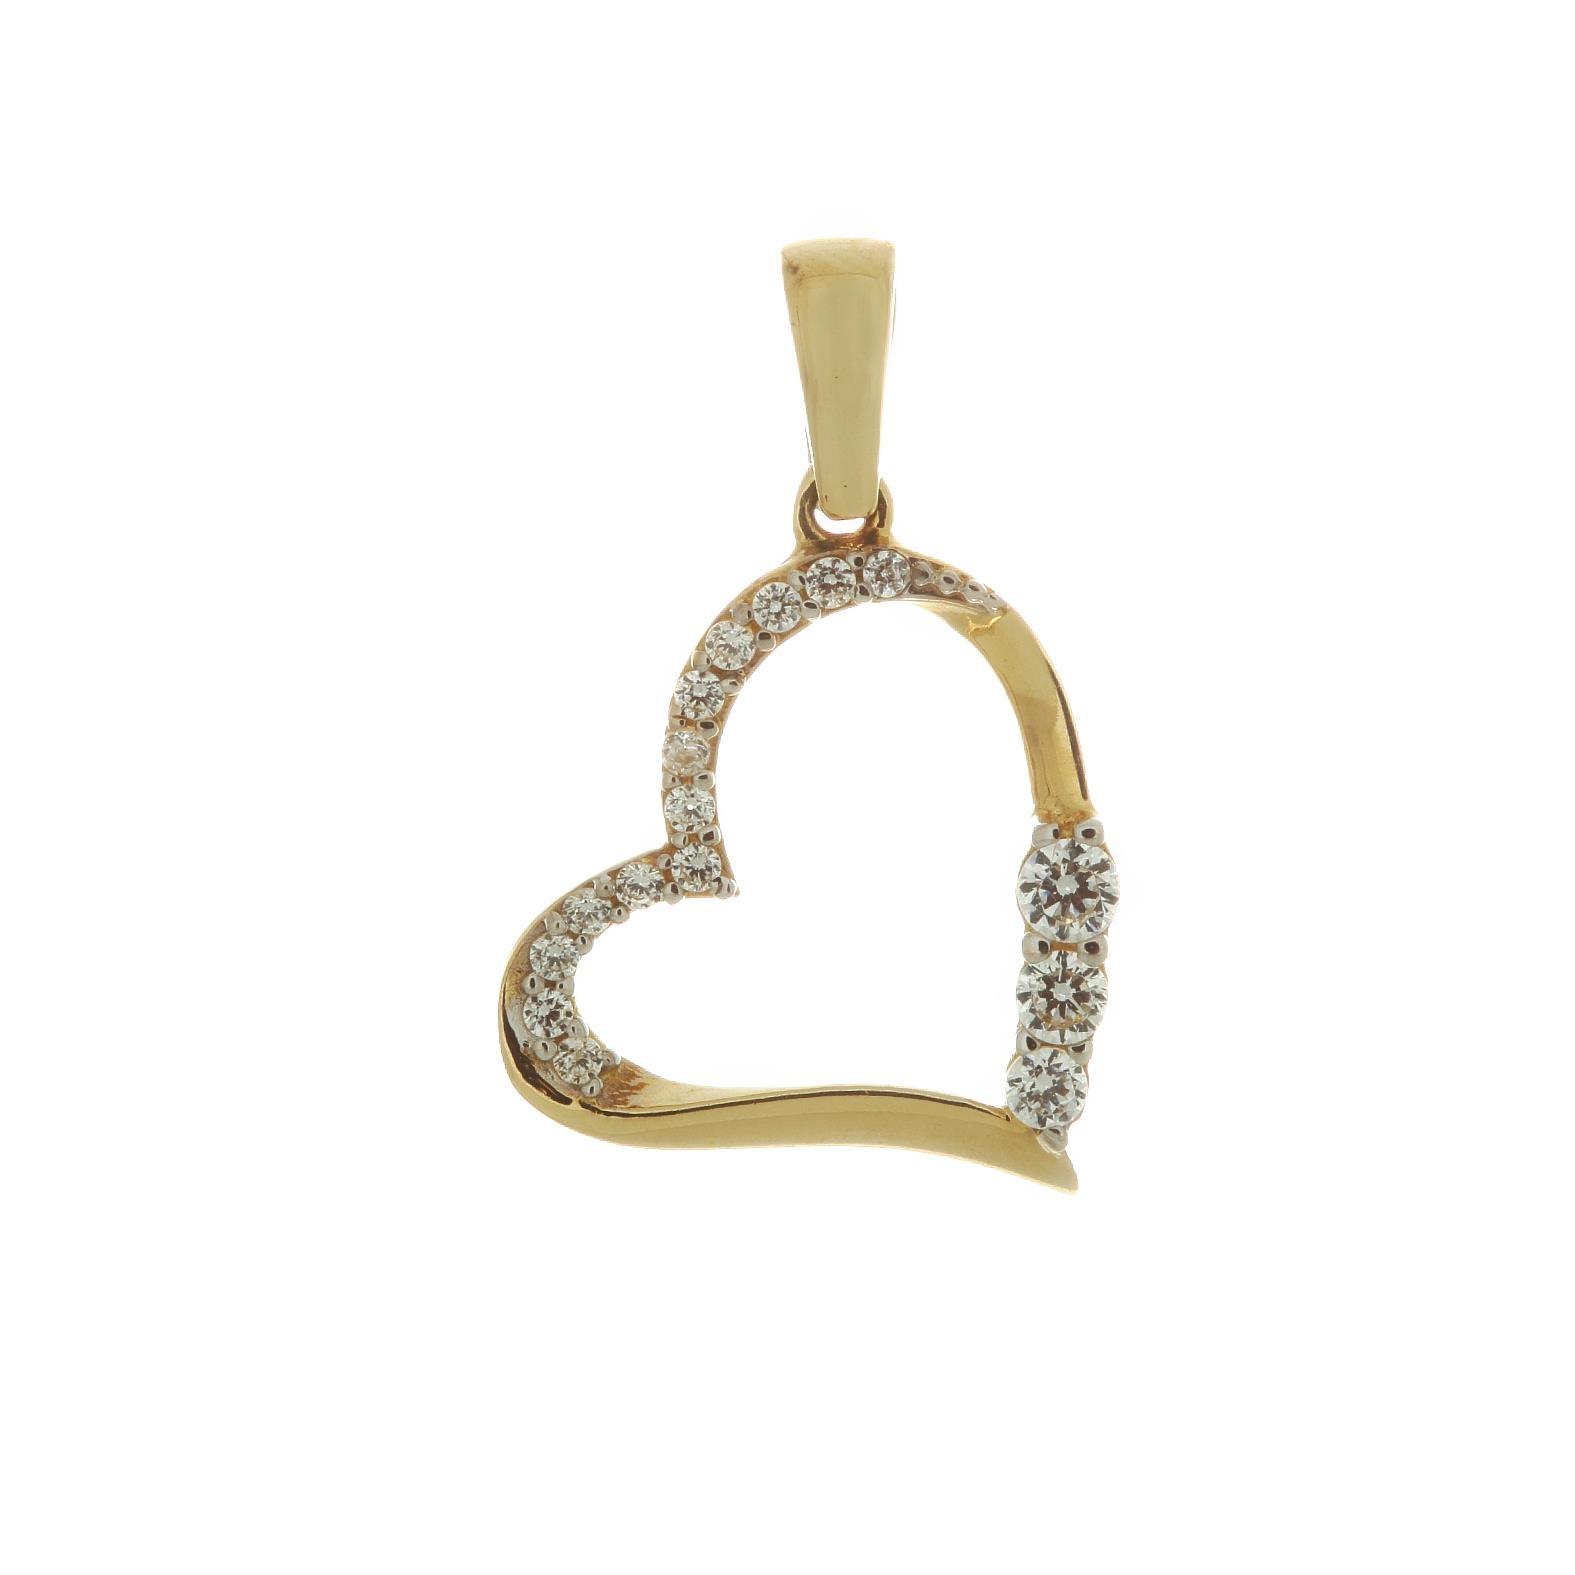 Zlatý prívesok srdce so zirkónmi 1VZ00054